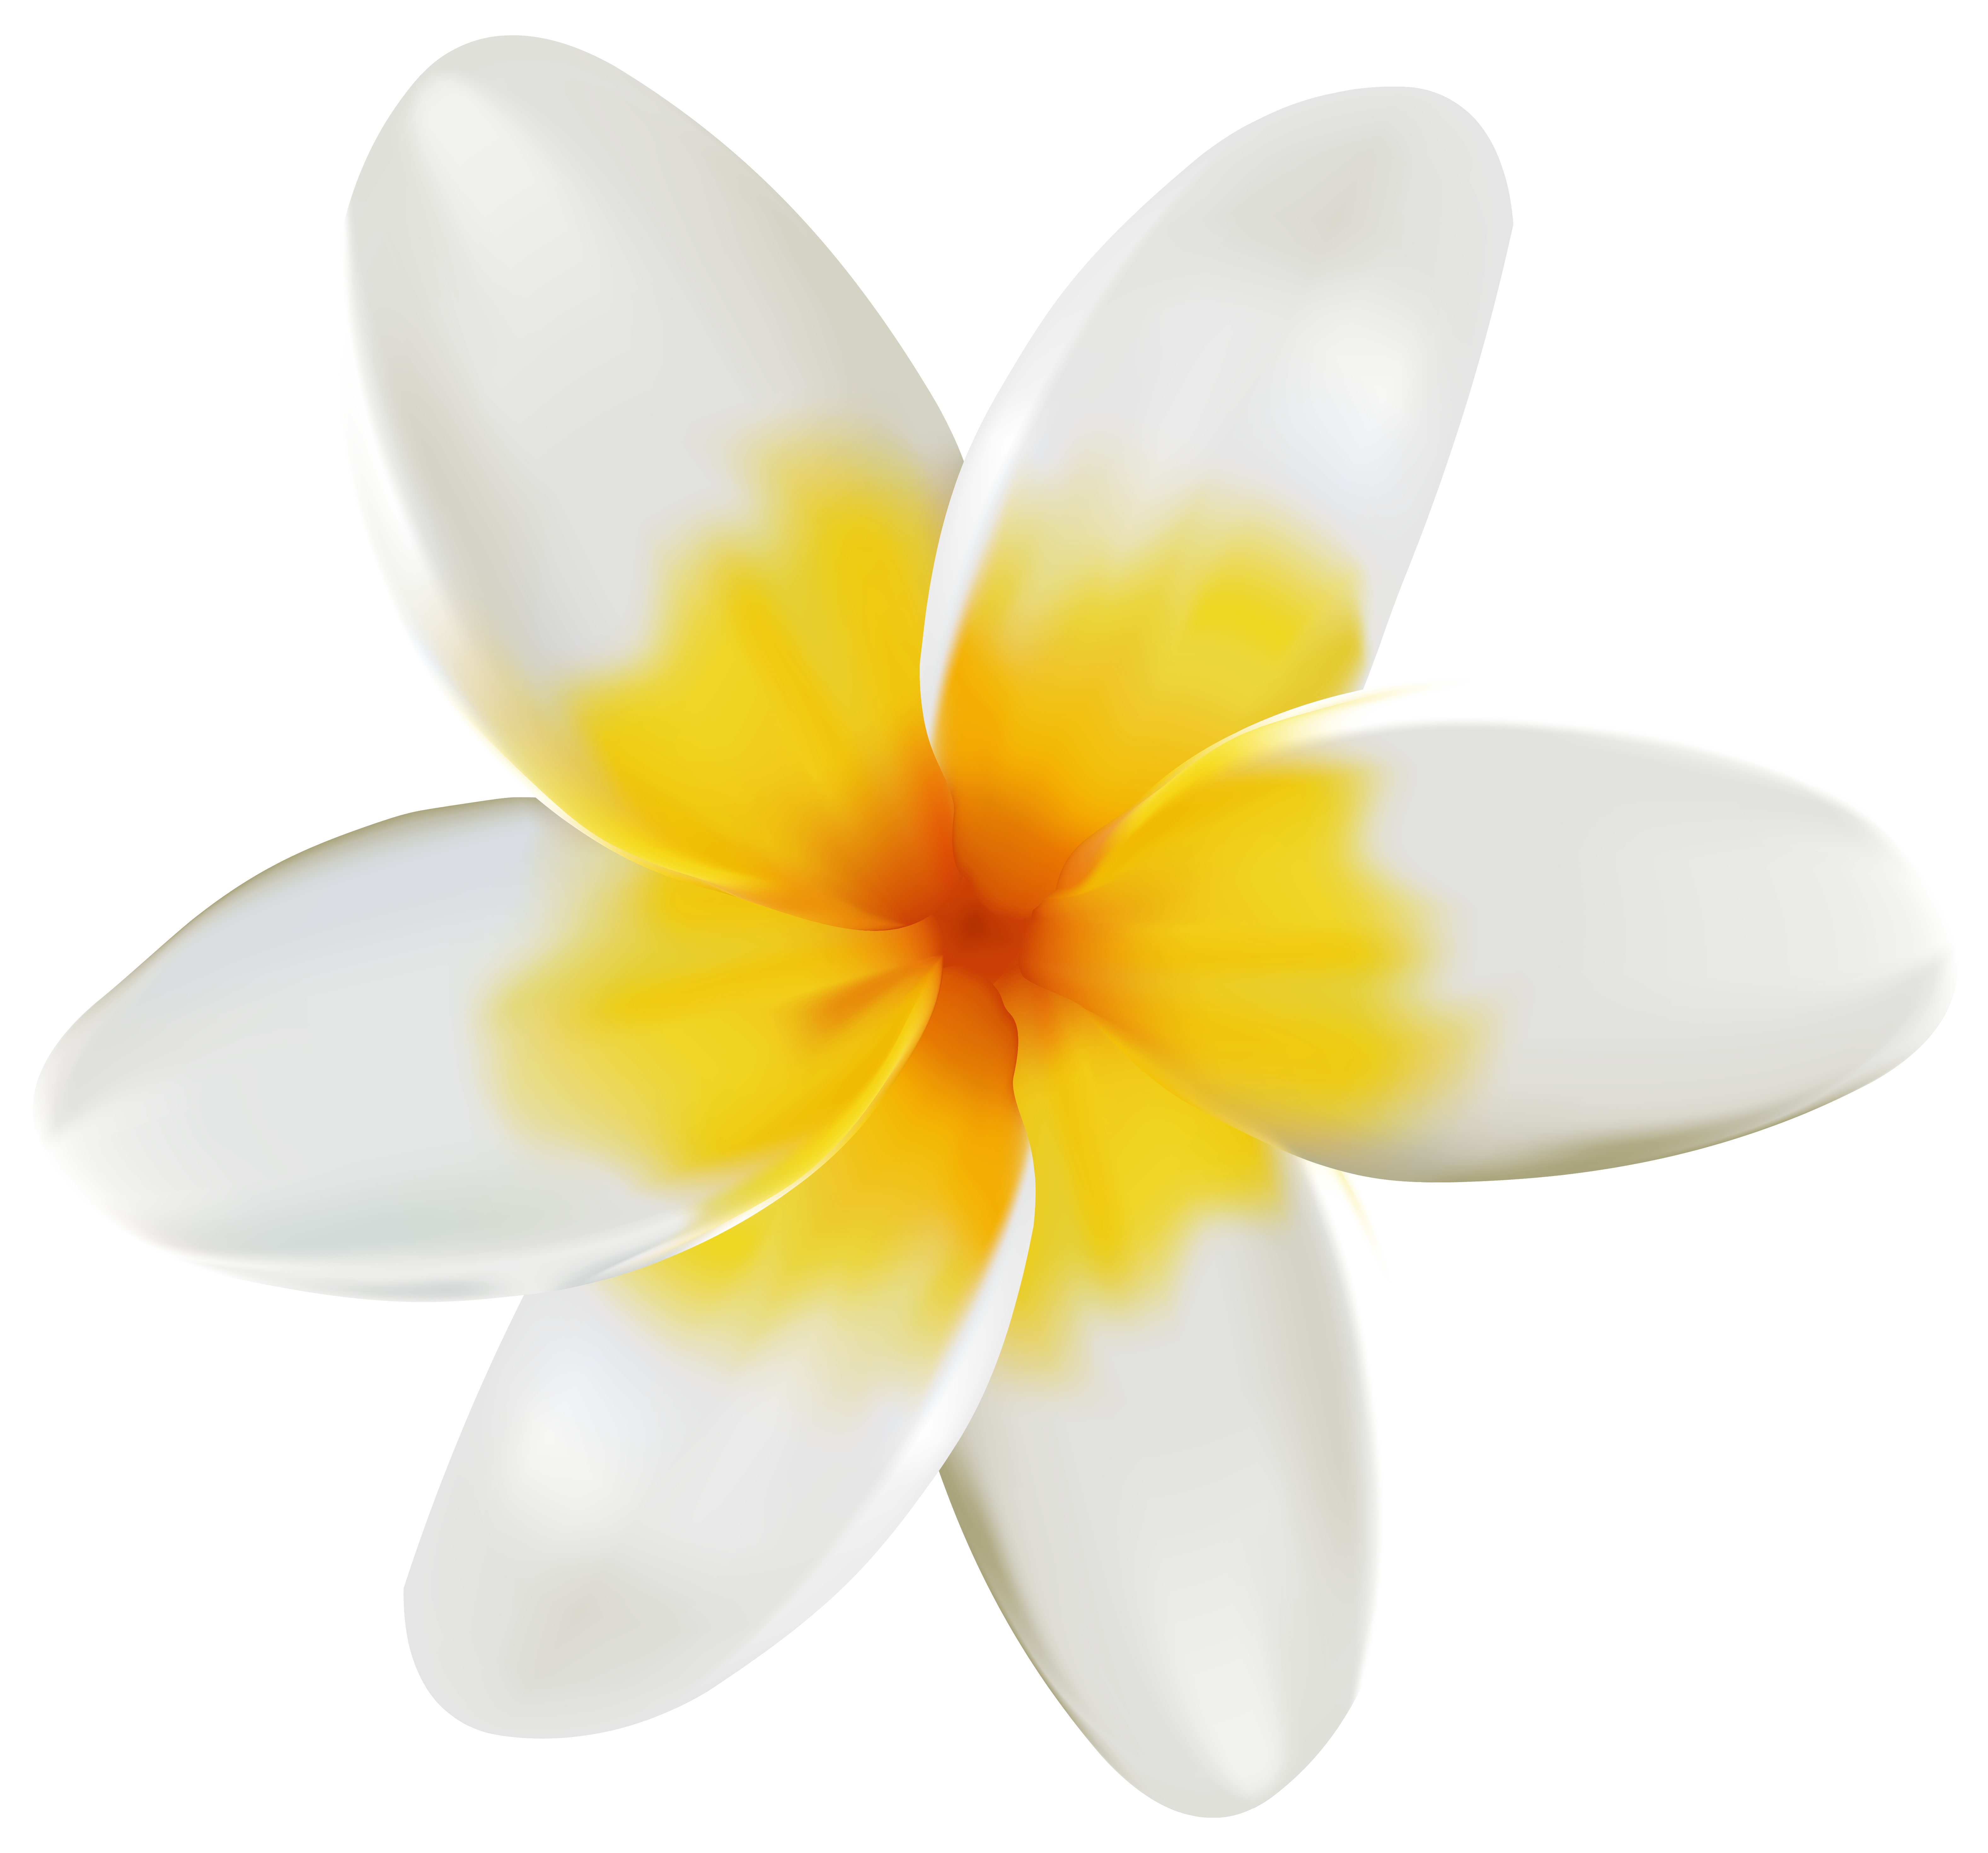 ... Plumeria Clipart - clipartall ...-... Plumeria Clipart - clipartall ...-13